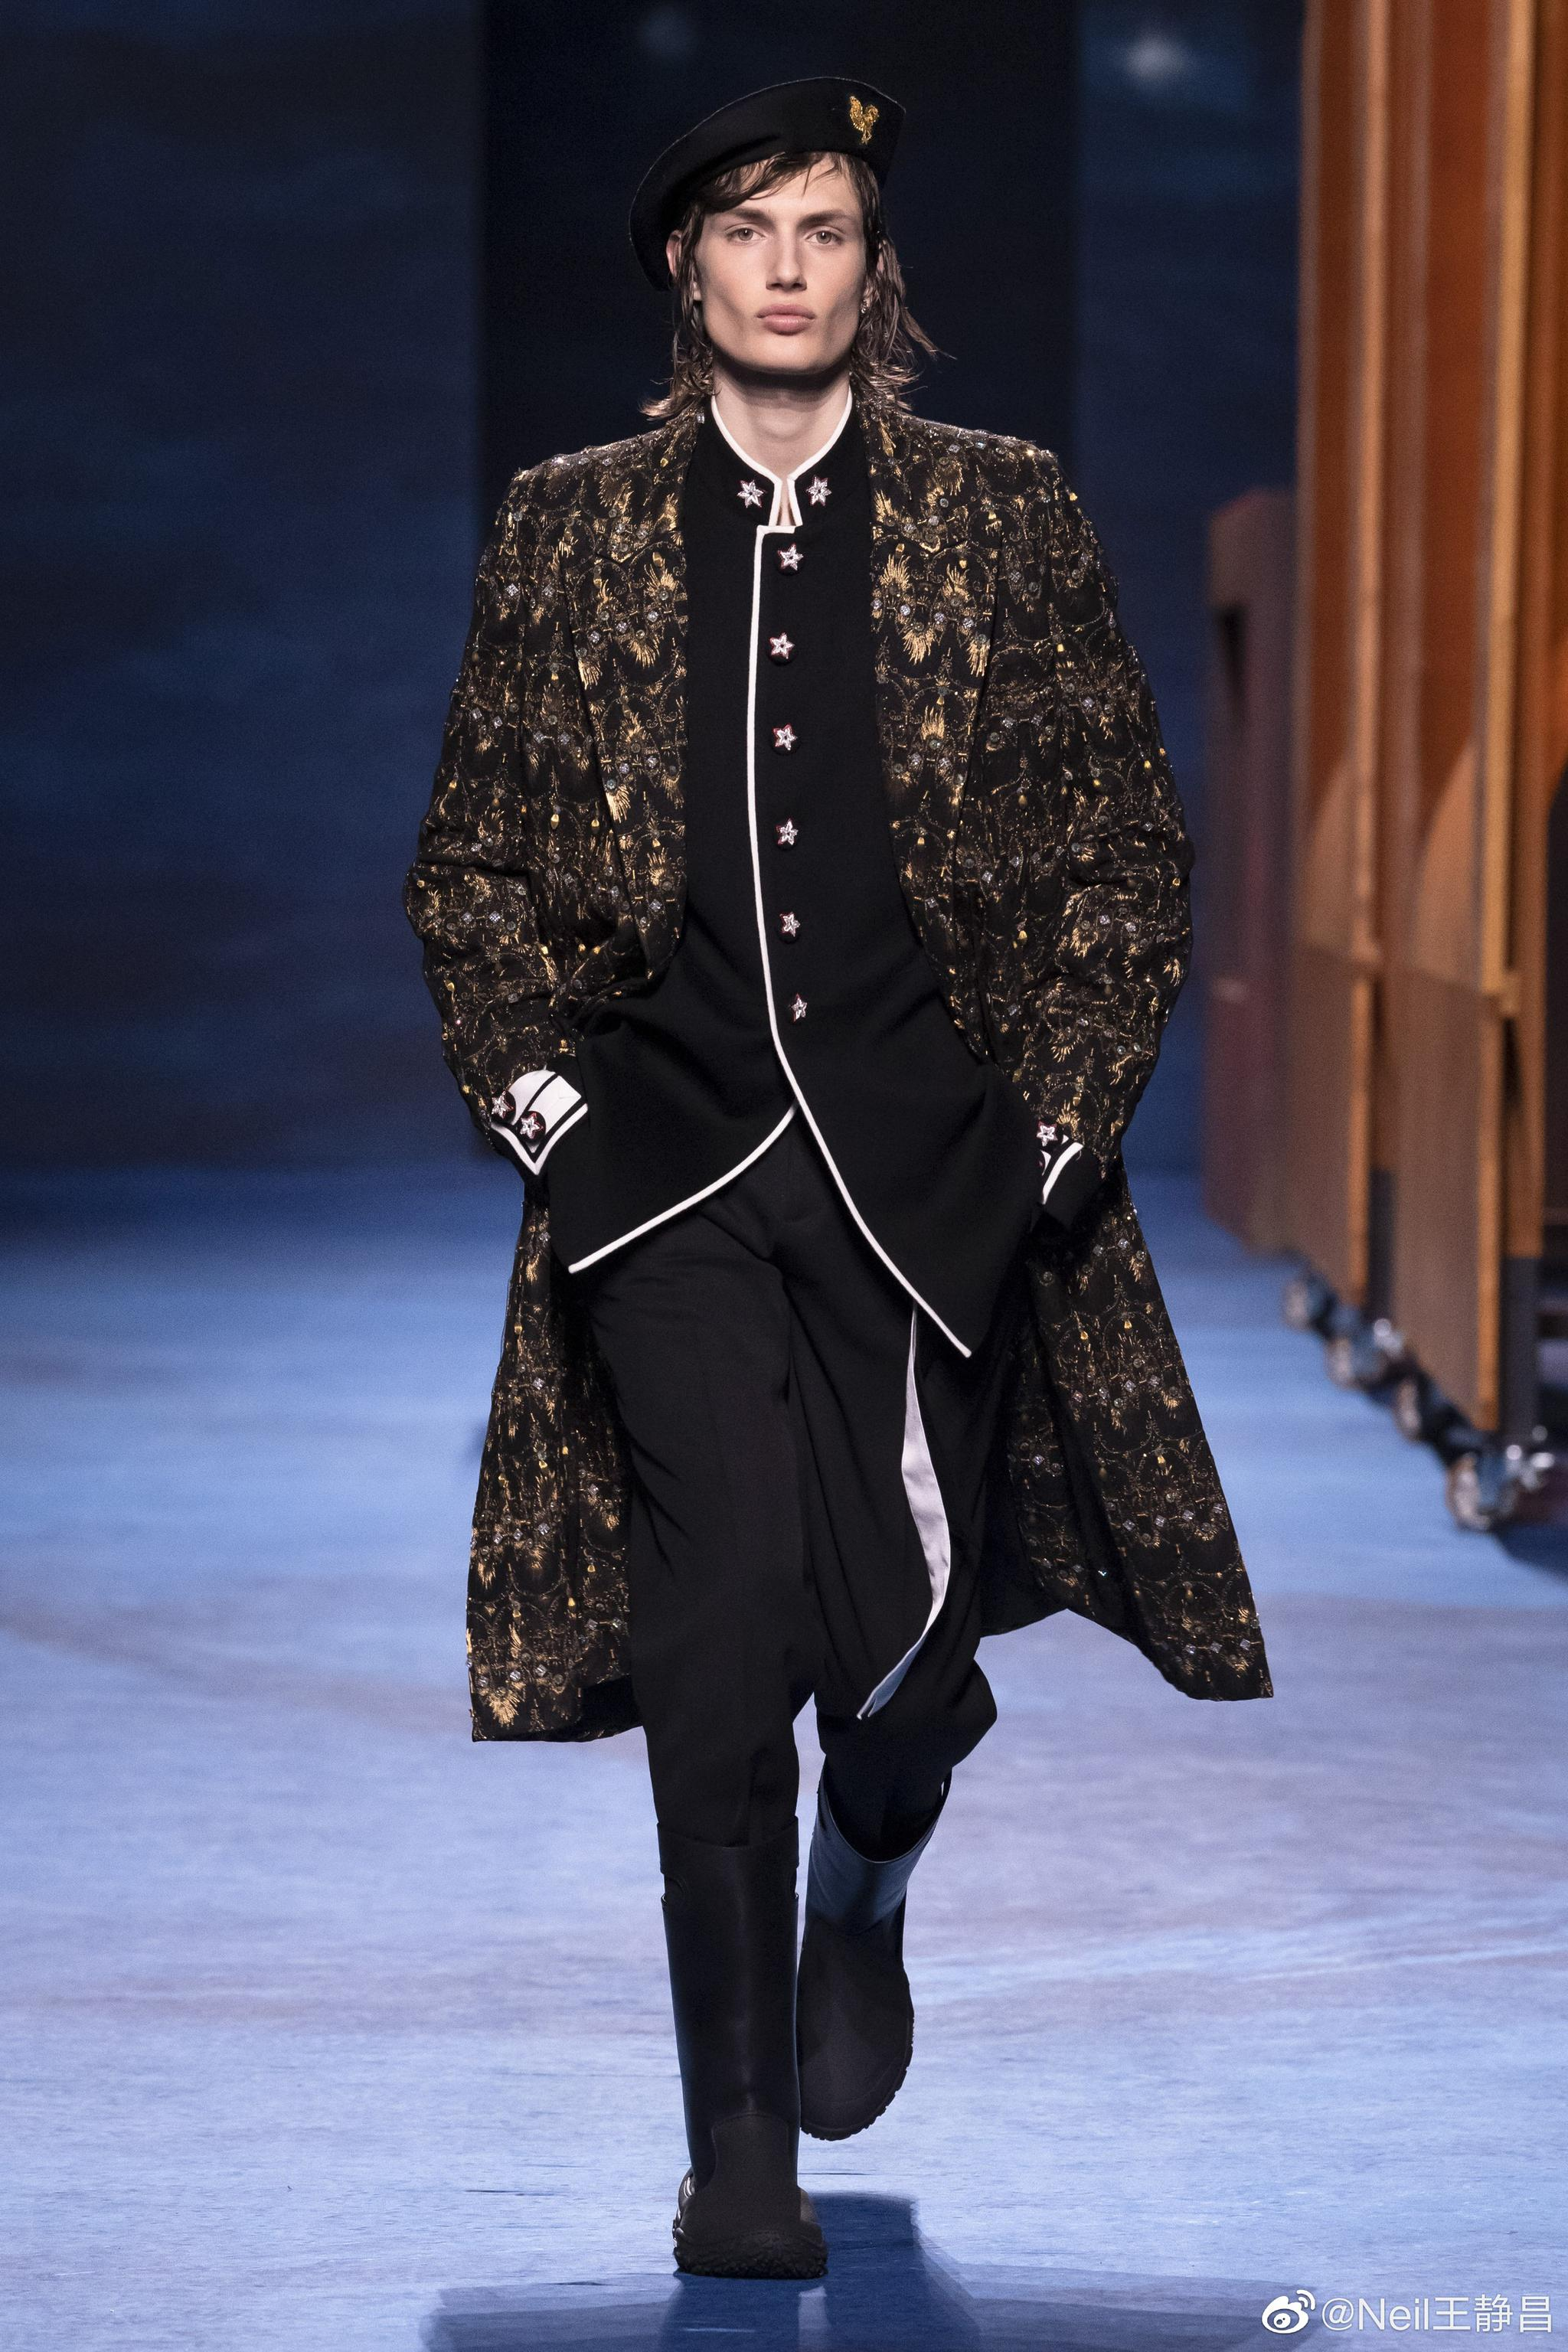 Dior 2021冬季男装系列 这一季看起来比较古典……